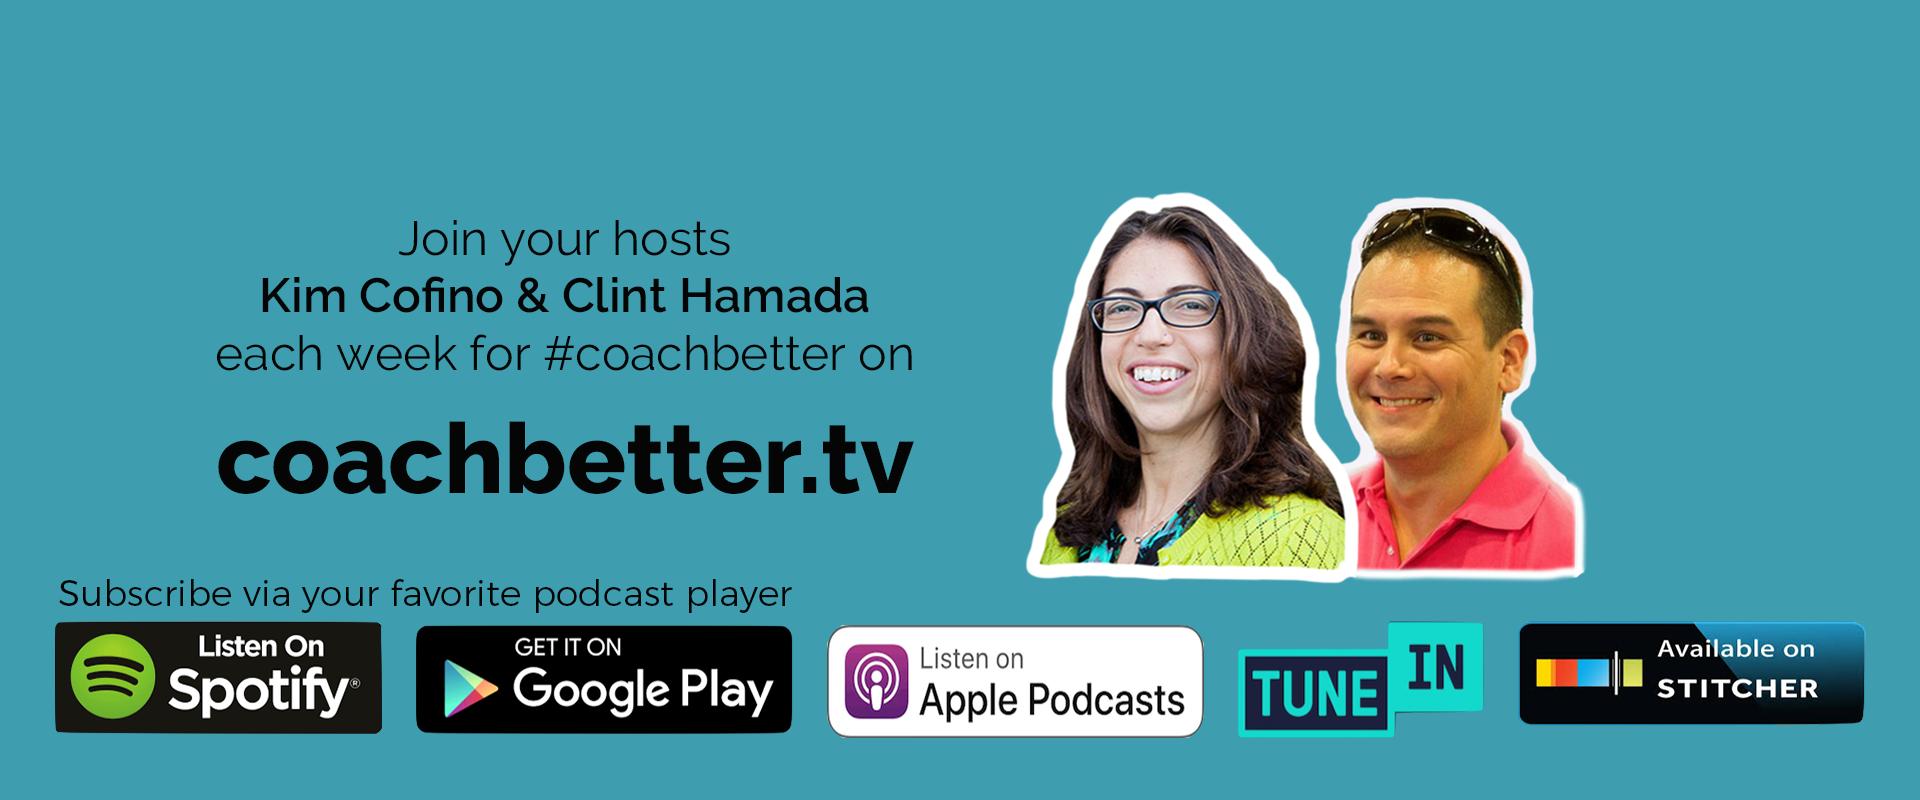 #coachbetter podcast with Kim Cofino & Clint Hamada